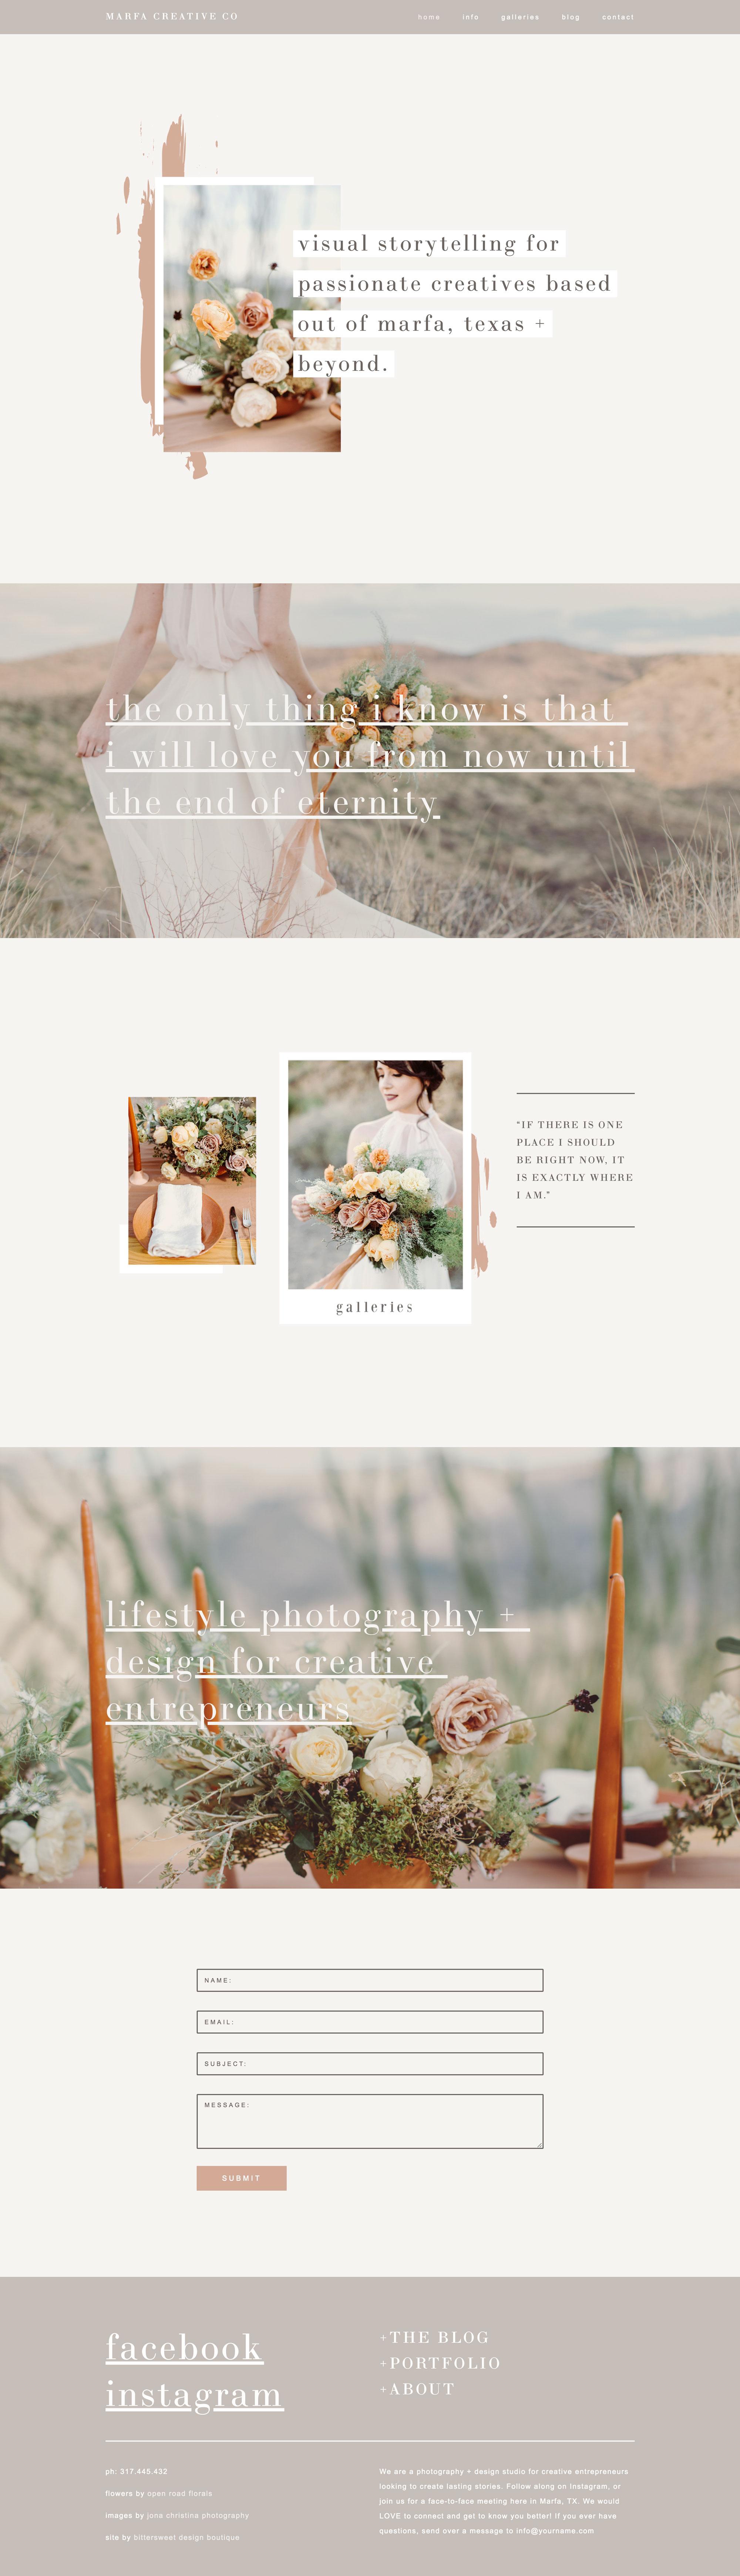 wedding photographer website design ideas | Squarespace website template for photographers